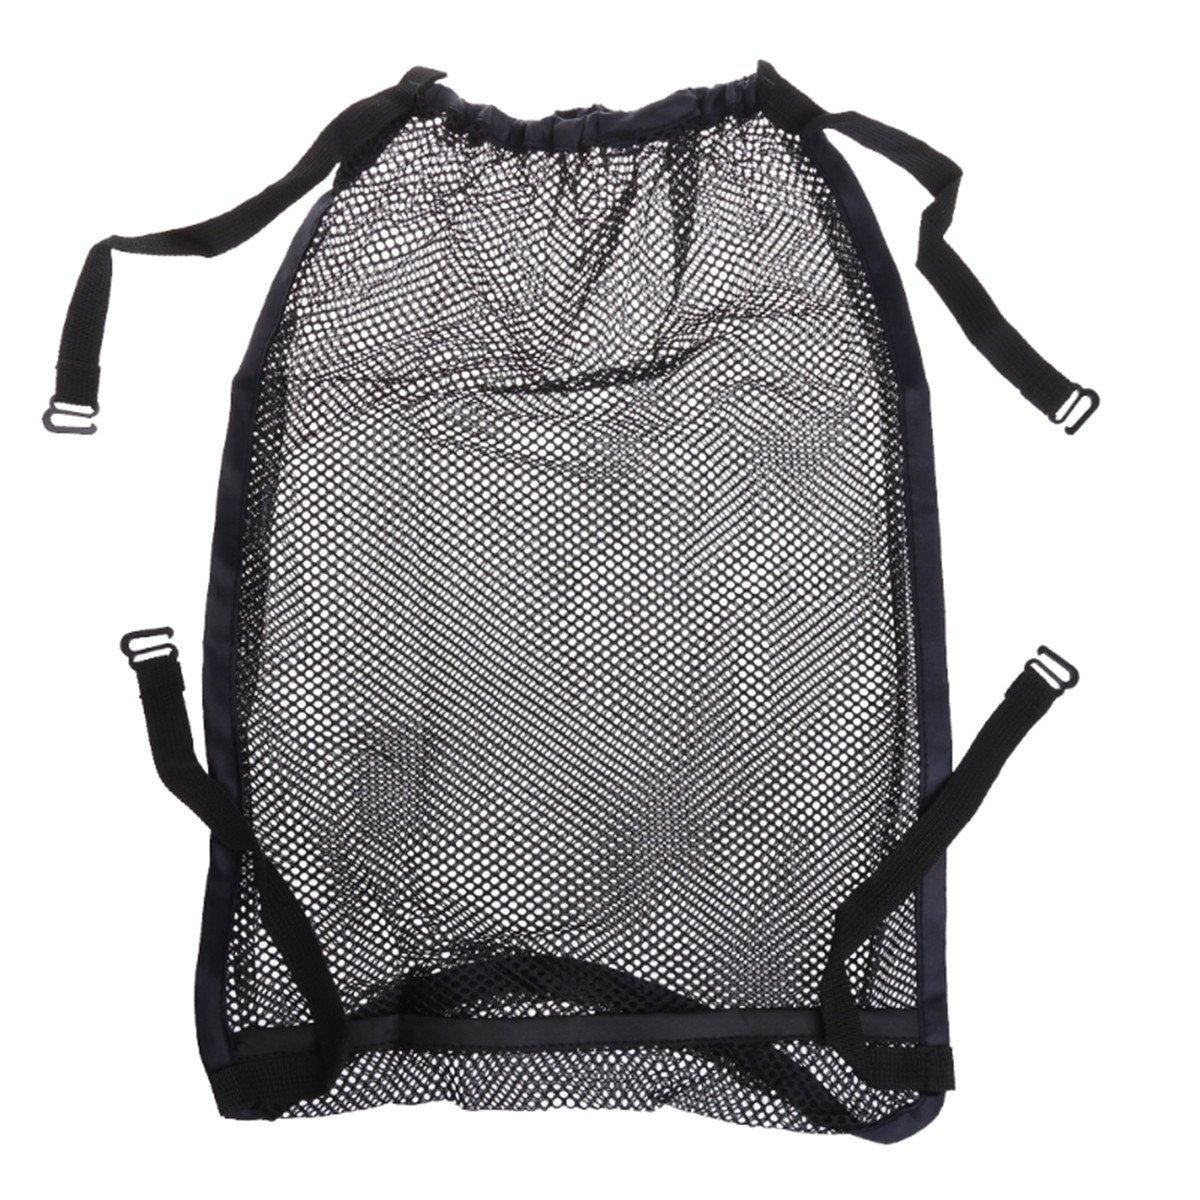 ARHSSZY Multi-Function Baby Stroller Accessory Portable Mesh Tuck Net Stroller String Bag Infant Stroller Organizer Bottle Diaper Bag Hanging Storage Universal Size Baby Stroller Organizer